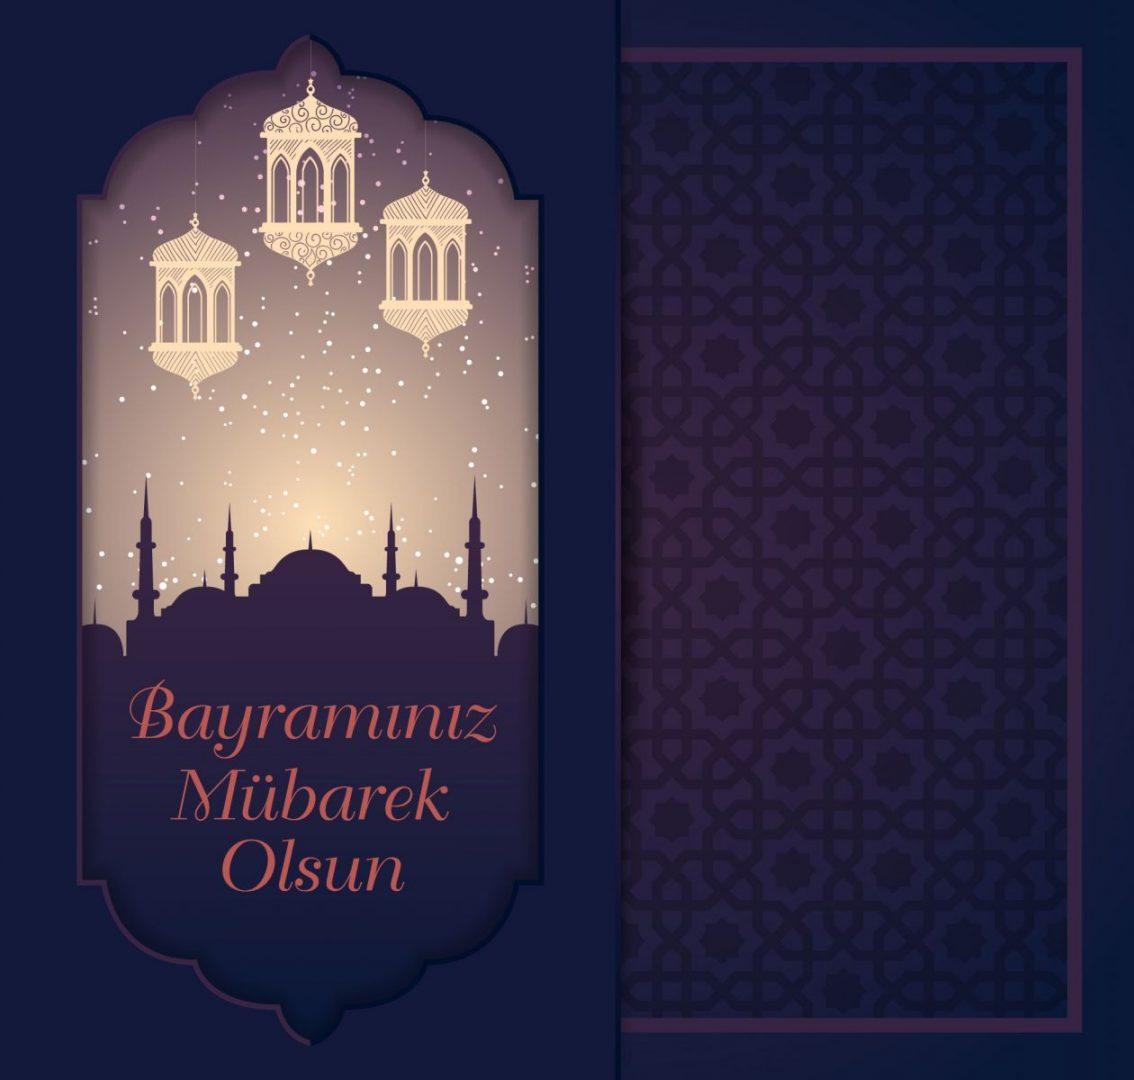 ramazan bayrami mesajlari 07 1134x1080 - Ramazan Bayramı Mesajları 2020